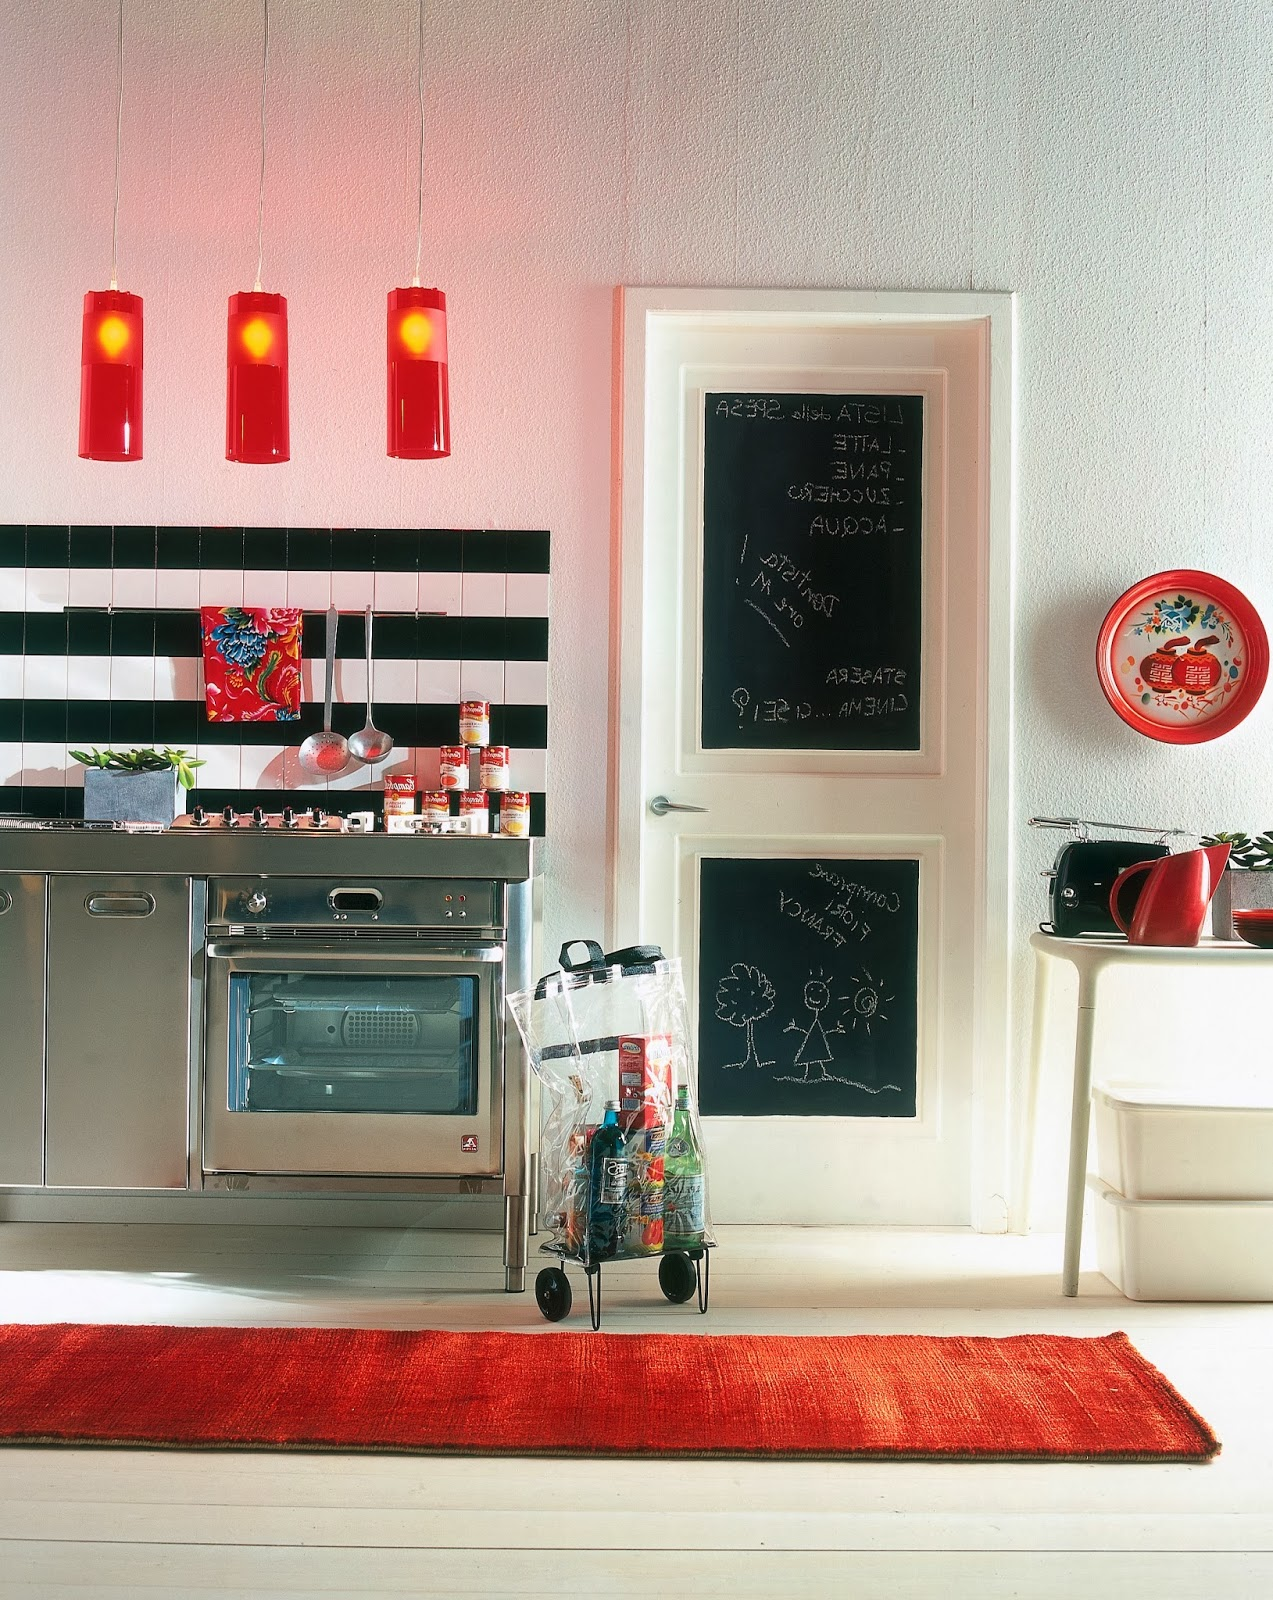 Pittura effetto lavagna - Pittura lavagna cucina ...